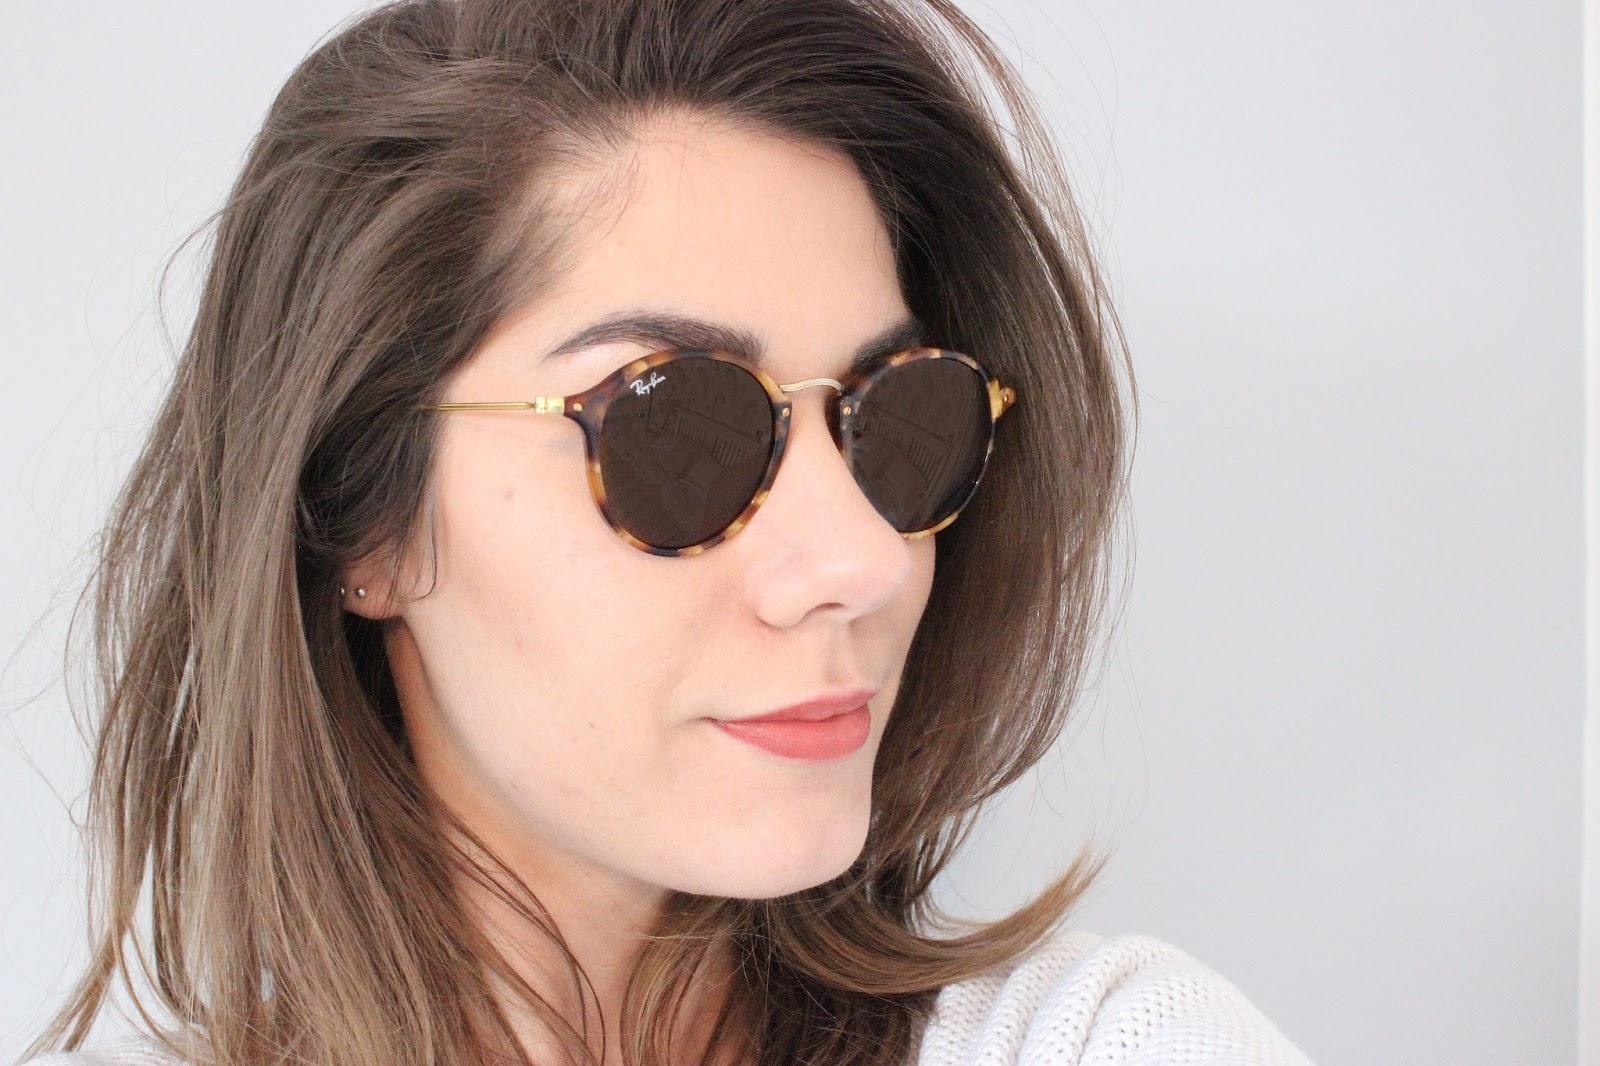 ray ban classic metal round sunglasses  ray ban classic round fleck sunglasses styled with hair down